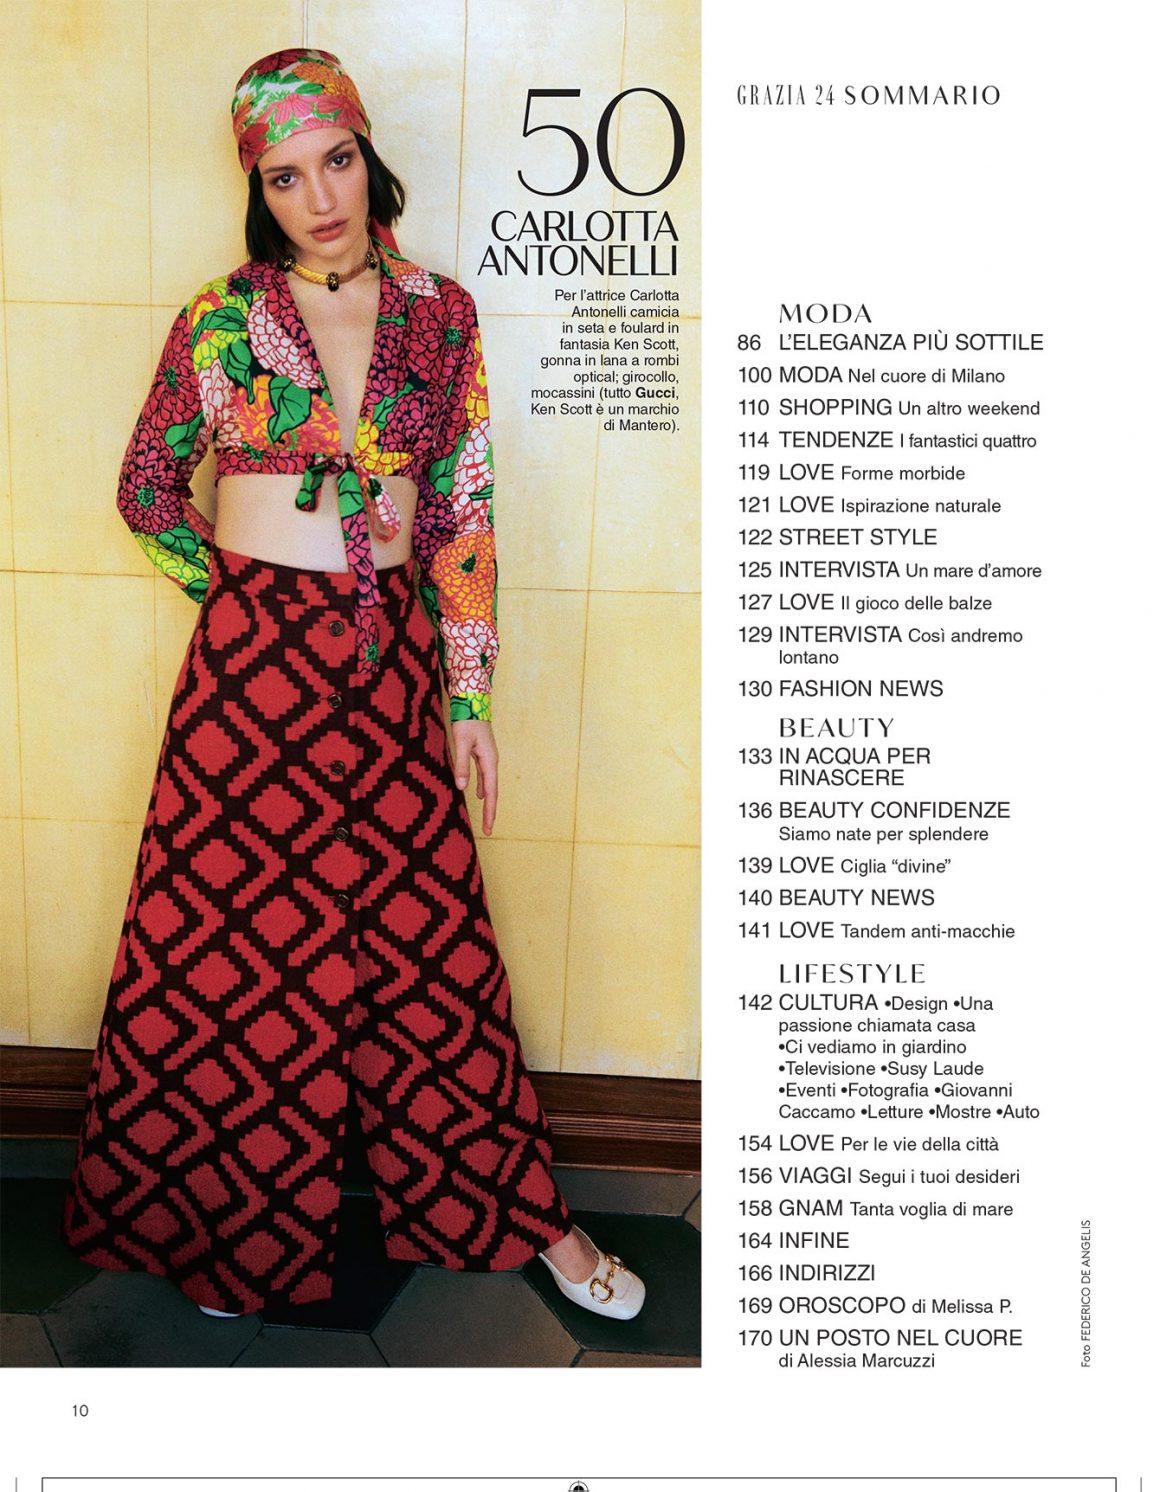 Grazia Italy Cover Story